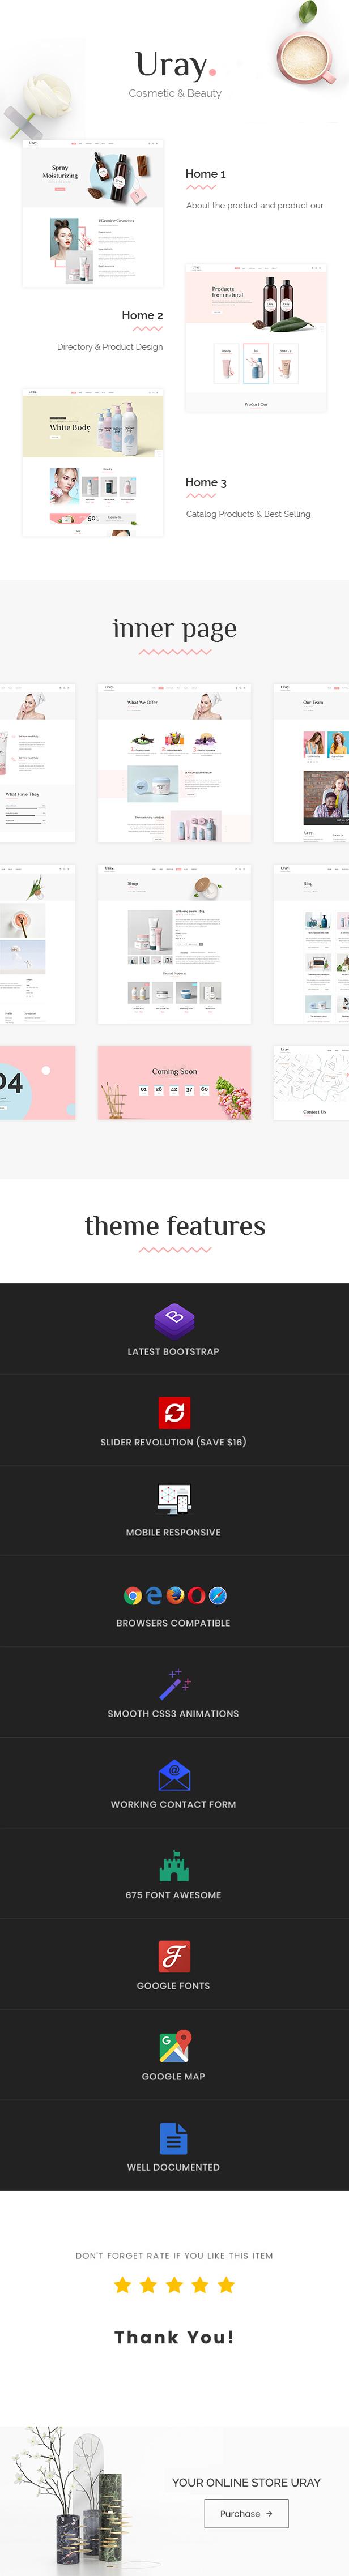 Uray - Cosmetic & Beauty Shop HTML5 Template - 1